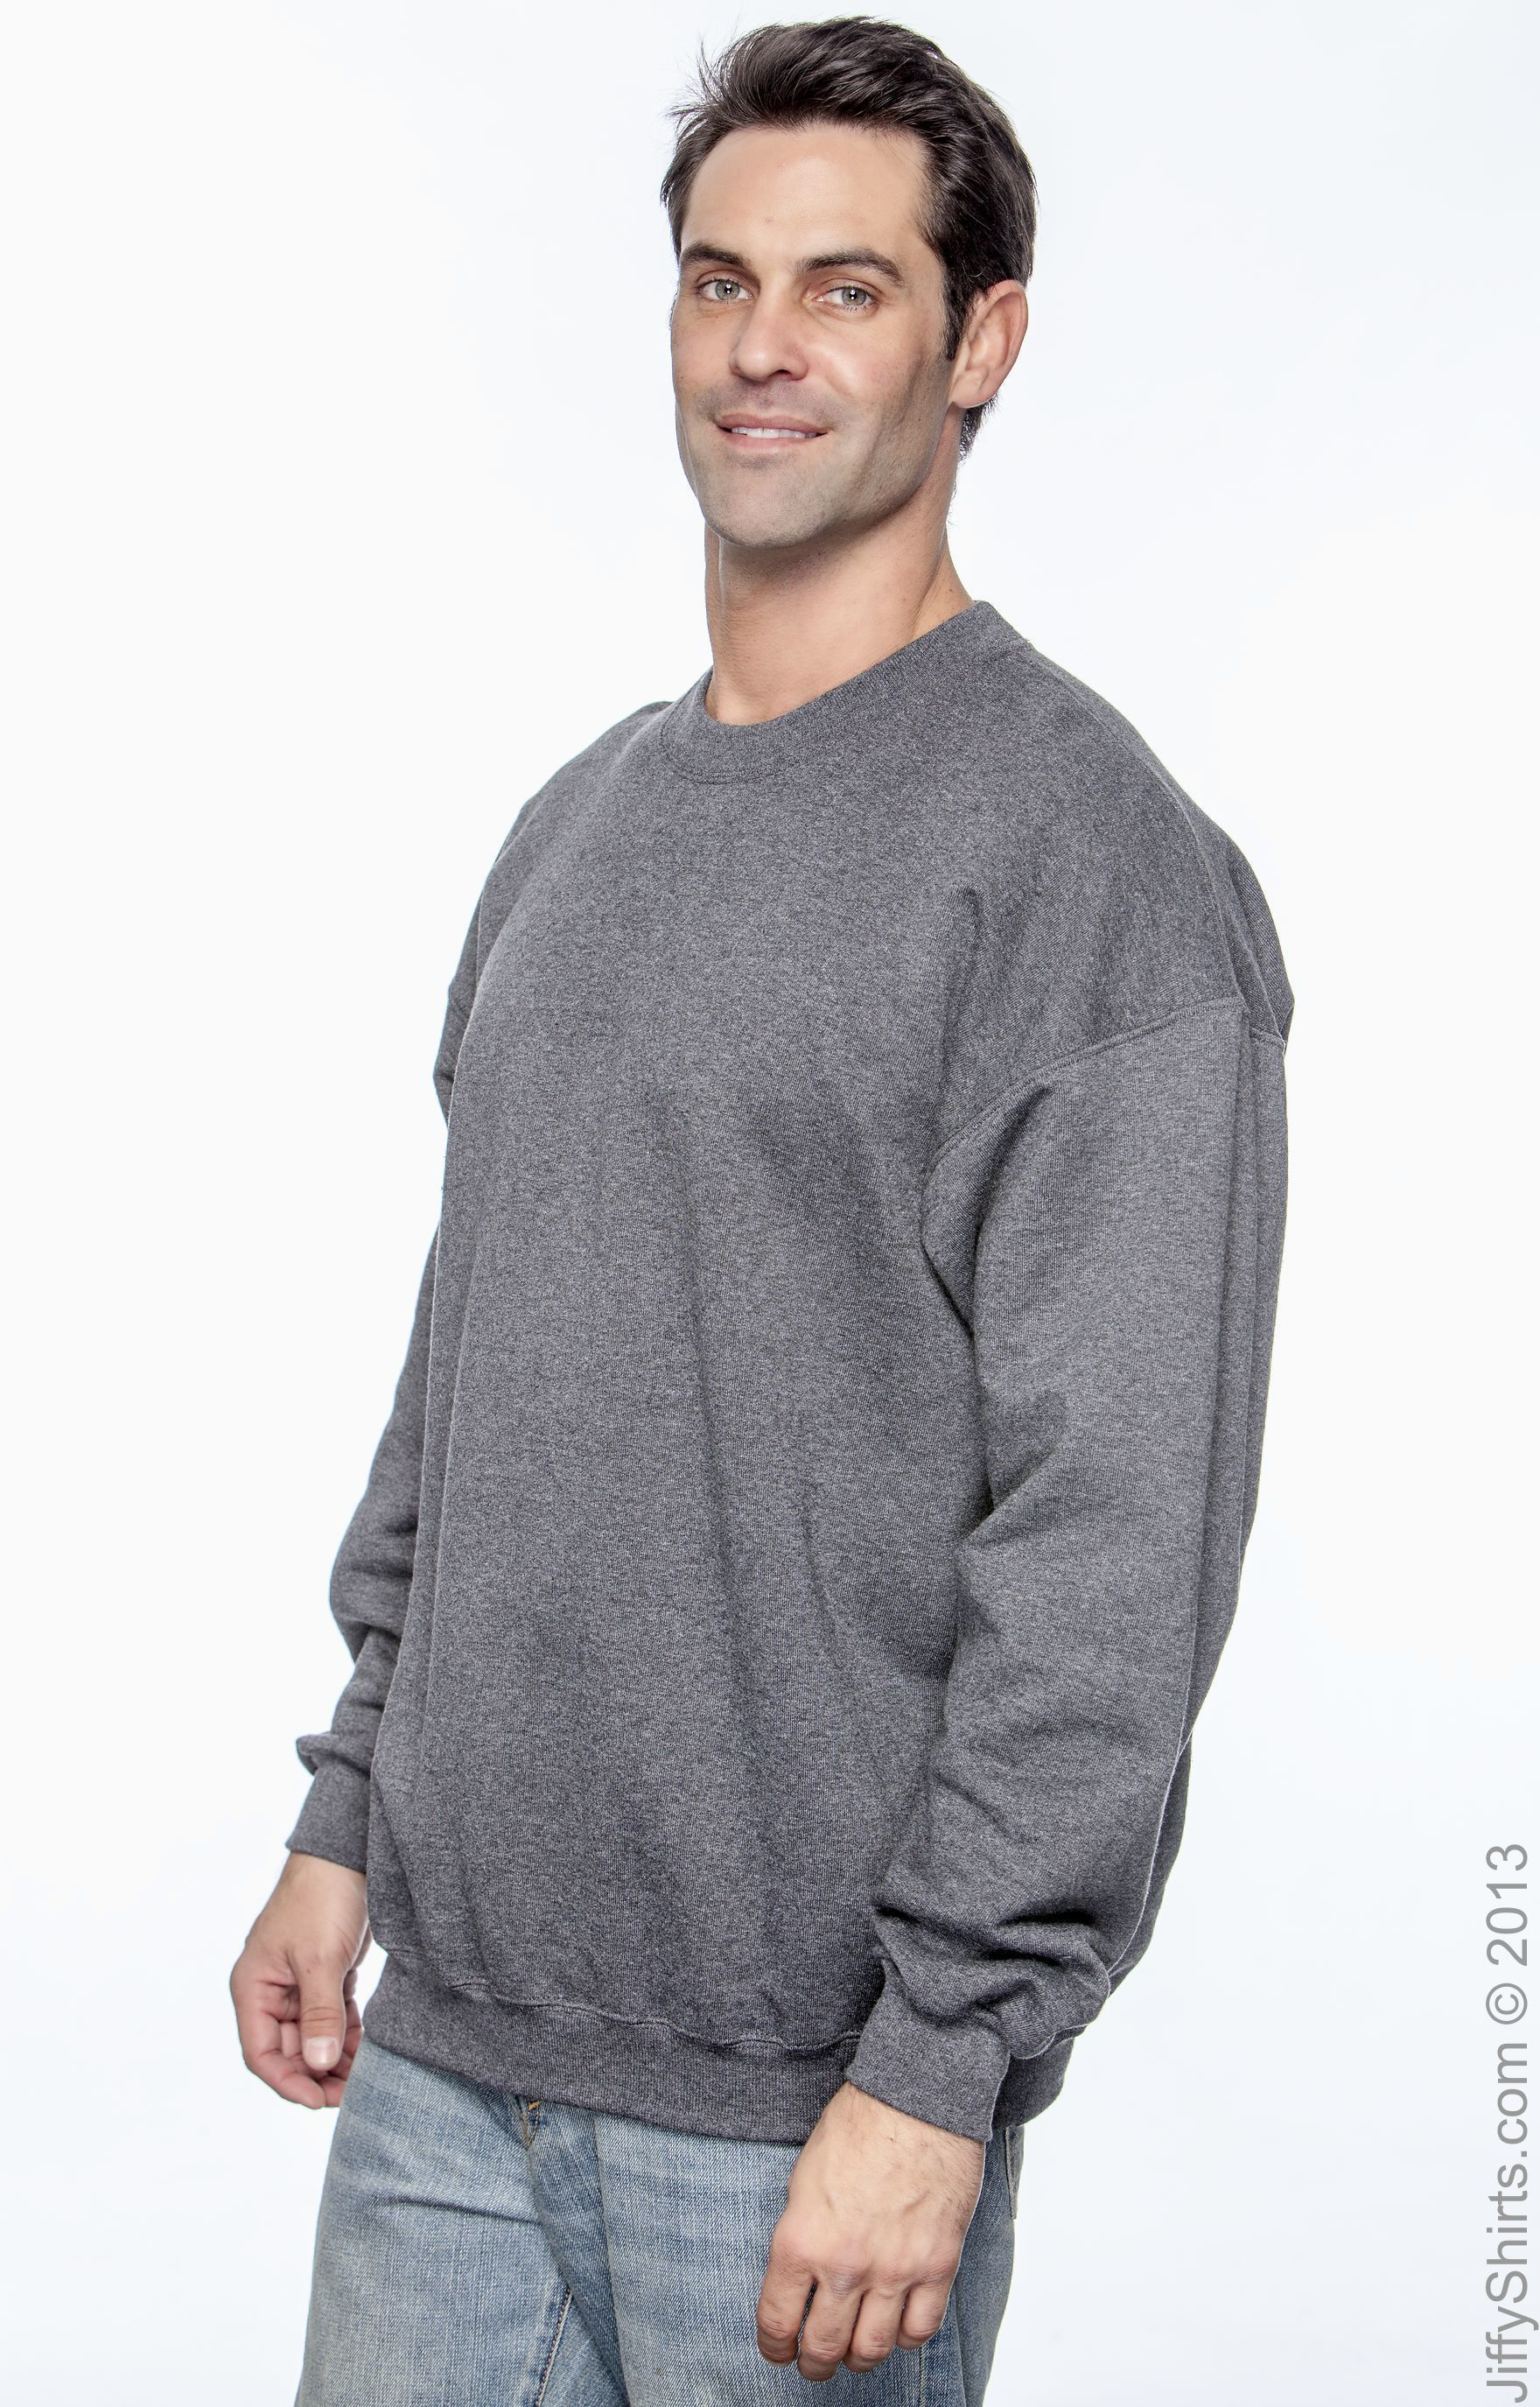 Hanes PrintProXP Ultimate Cotton Crewneck Sweatshirt F260 S-3XL NEW